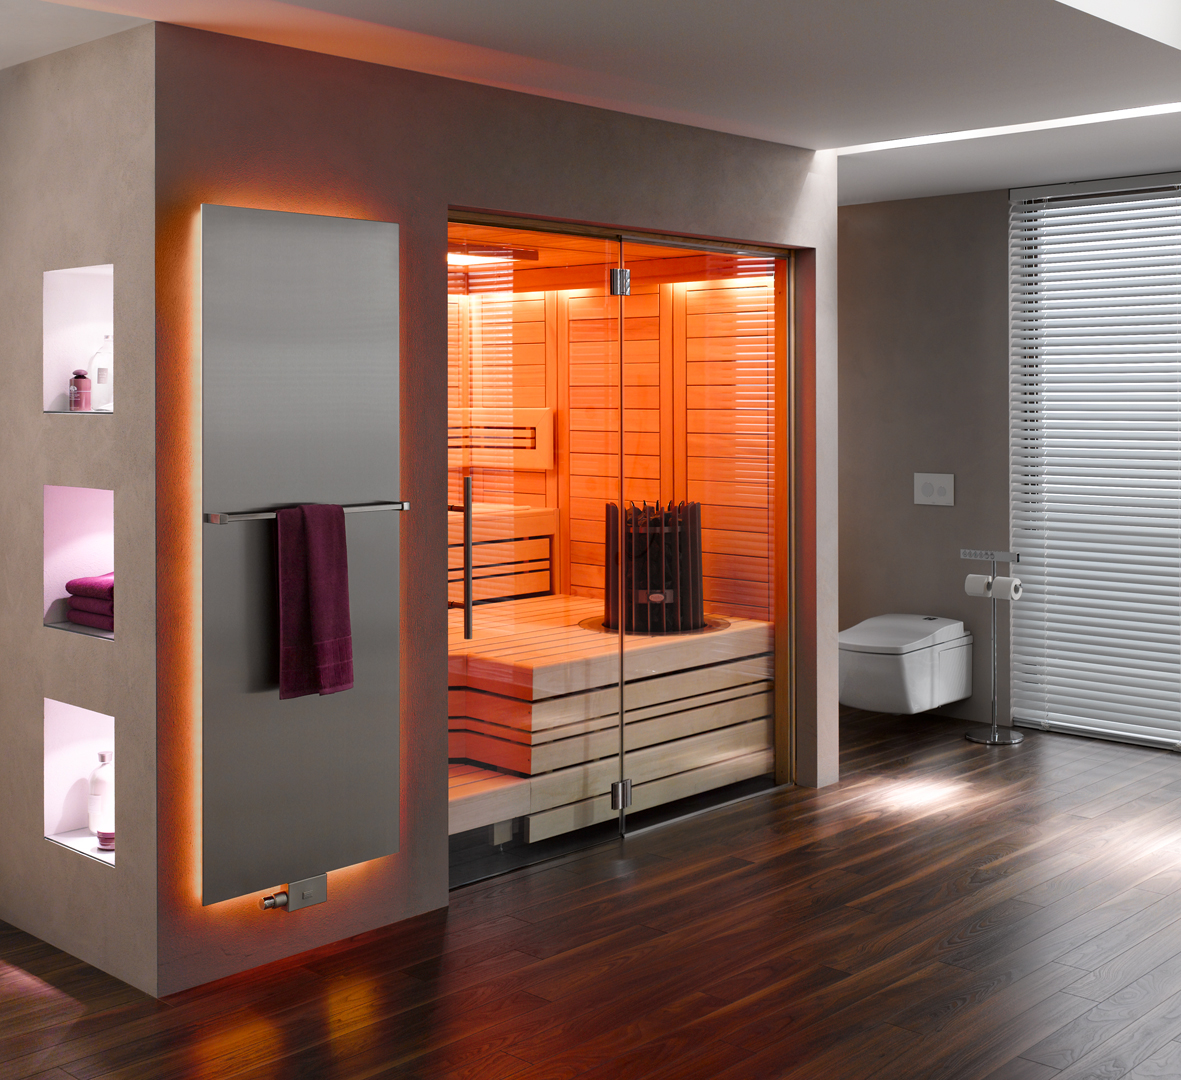 Sauny HELO, infra sauny, typ sauny, výber sauny, predaj sáun, Fisa sauny, Saunabau, parná sauna, wellness, soľná infra sauna, cupreme